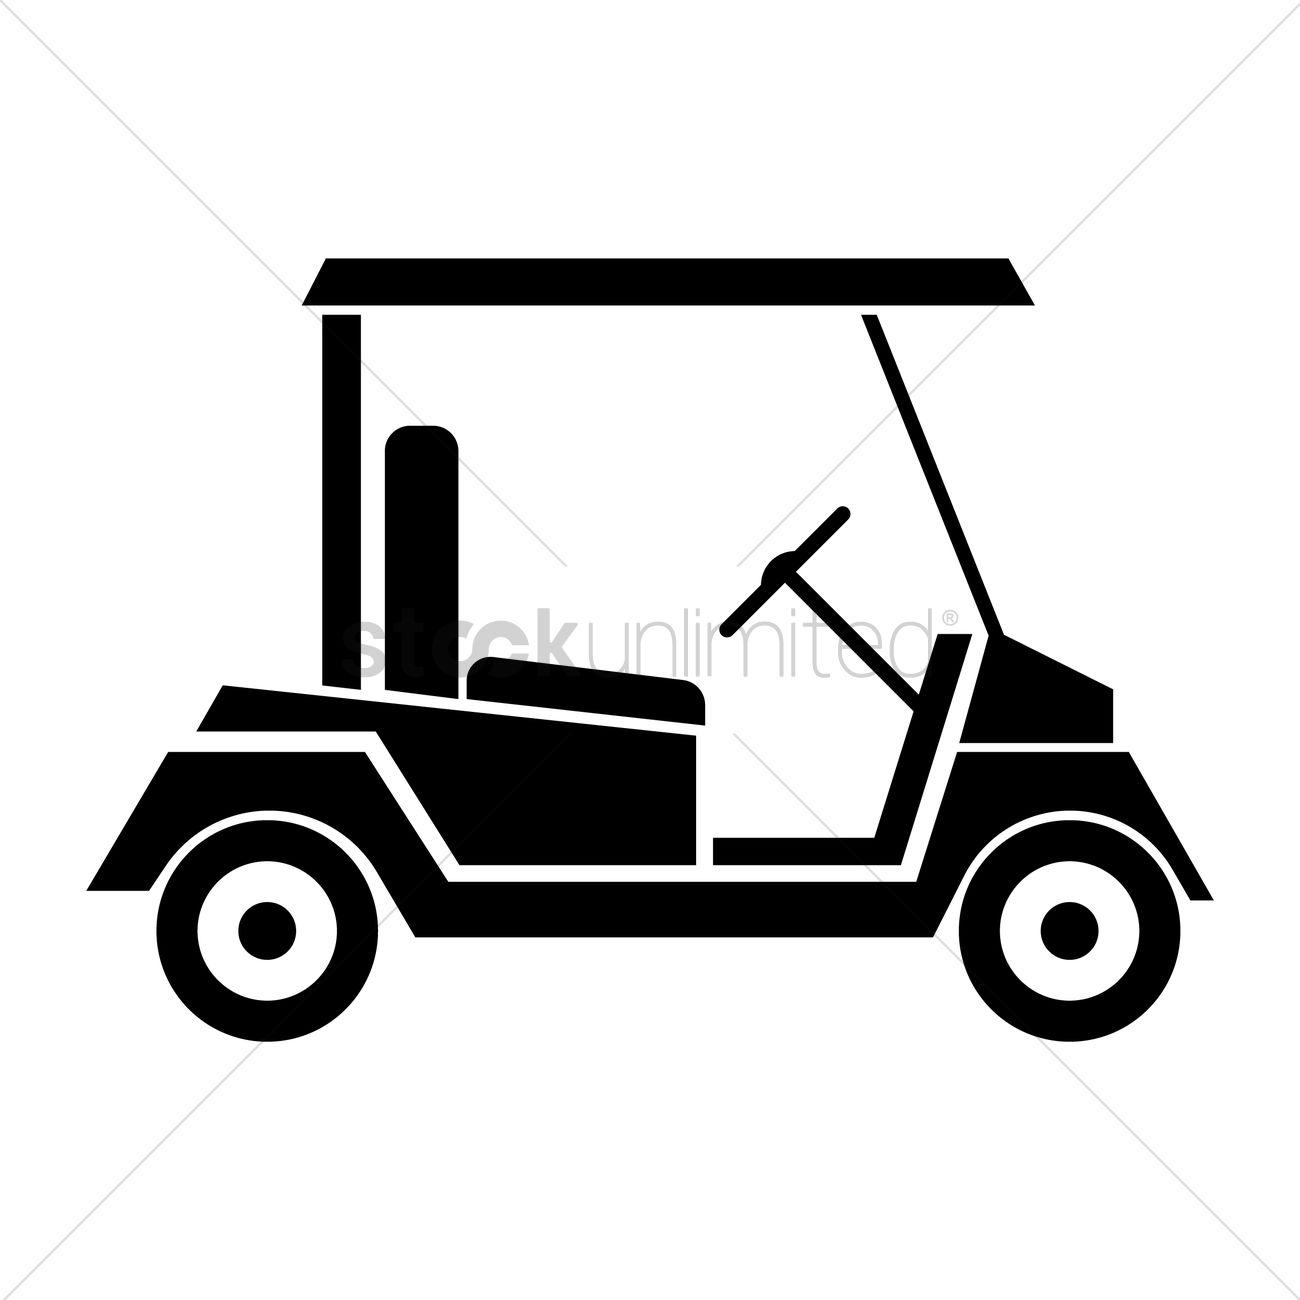 1300x1300 Free Golf Cart Vector Image